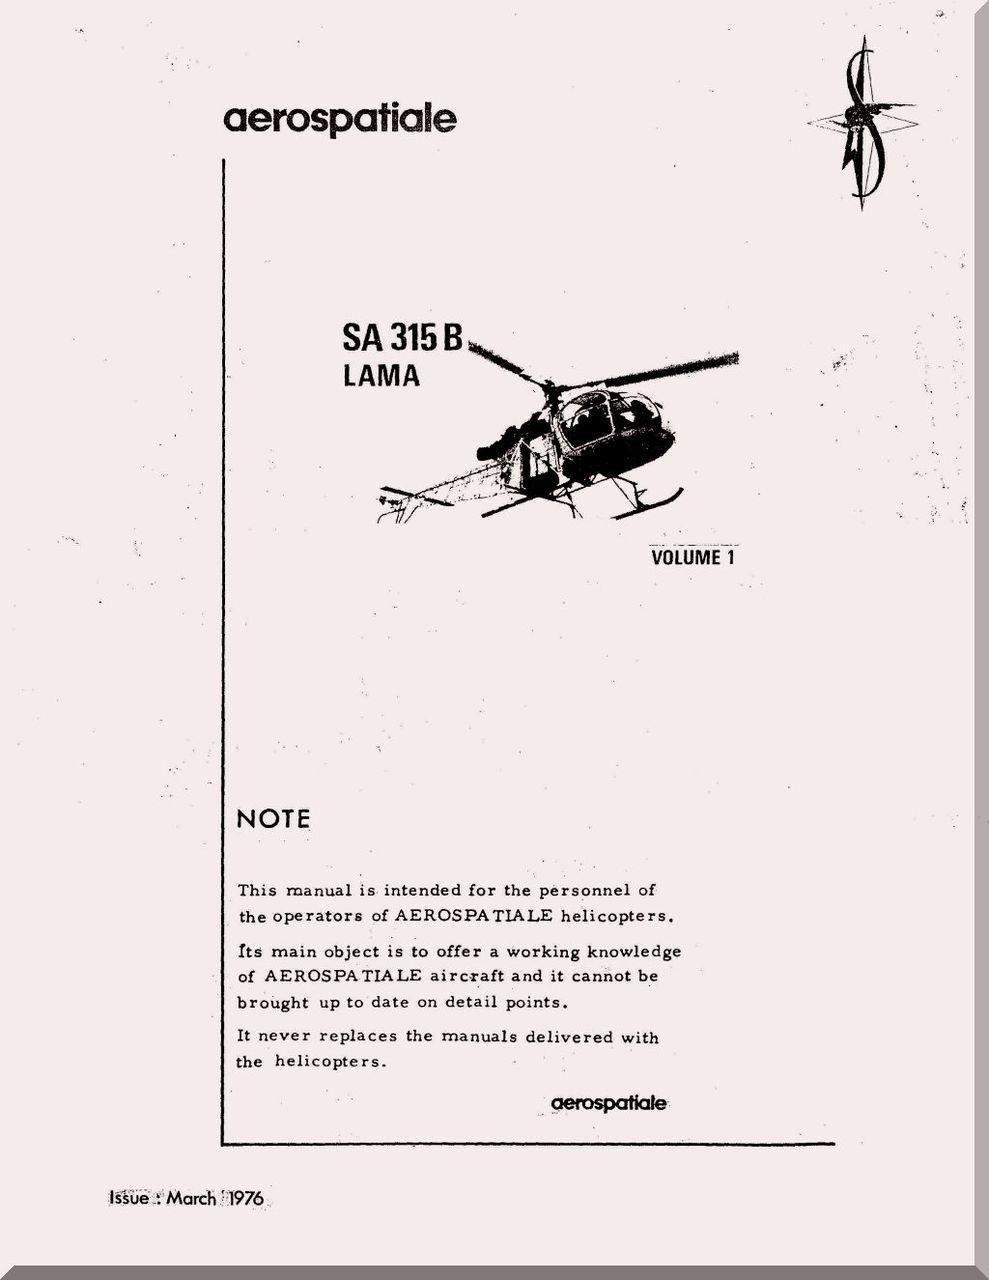 Sud Aviation / Aerospatiale SA.315 B Helicopter Training